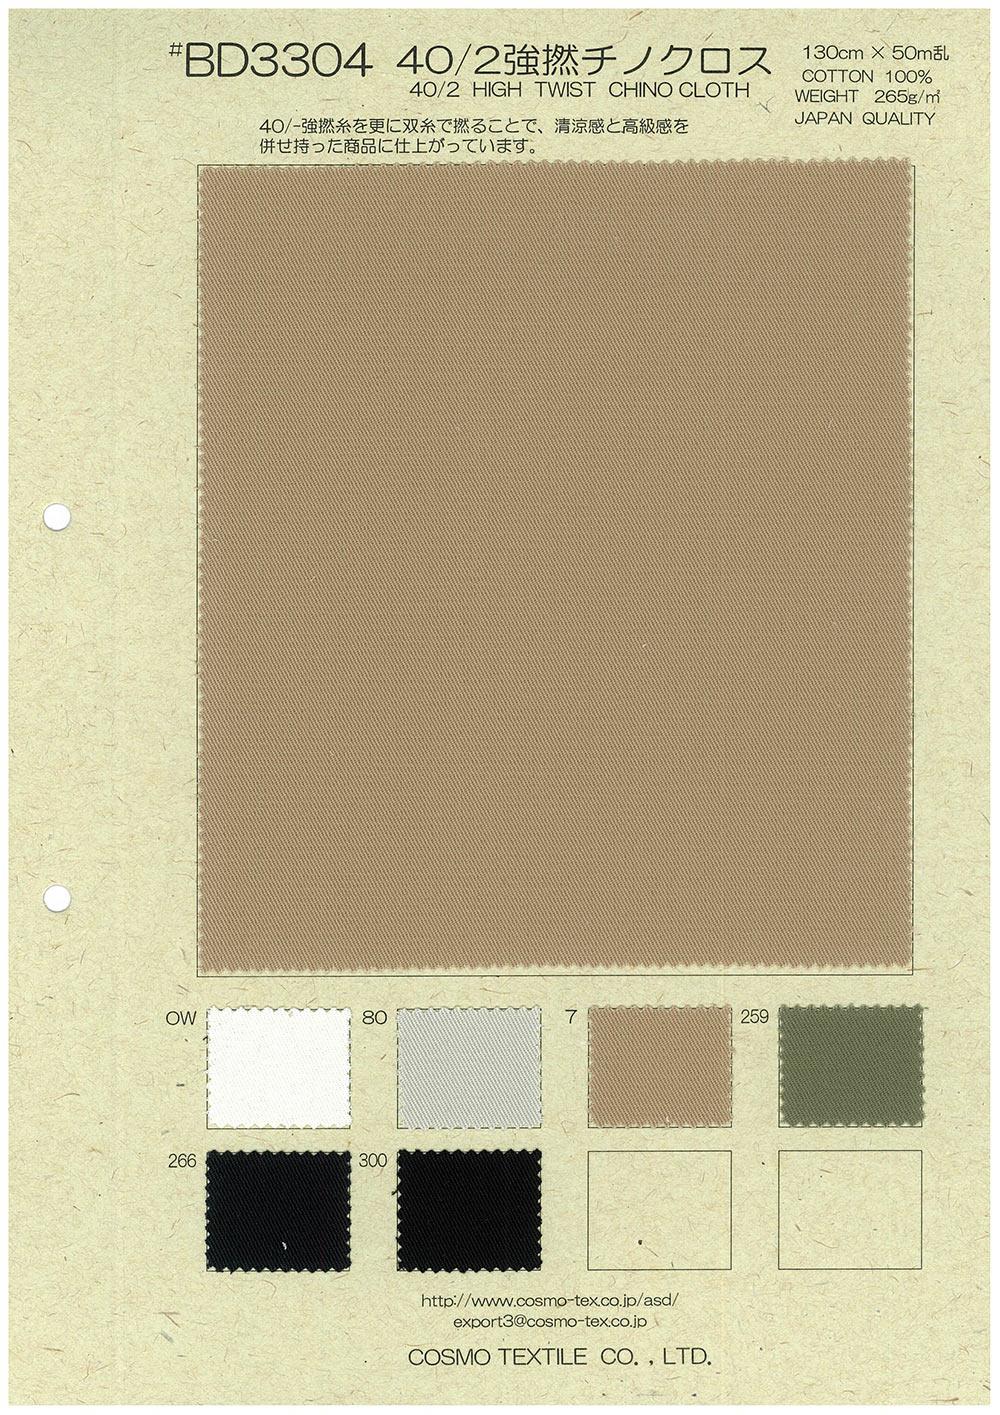 BD3304 40/2強撚チノクロス[生地] コスモテキスタイル/オークラ商事 - ApparelX アパレル資材卸通販